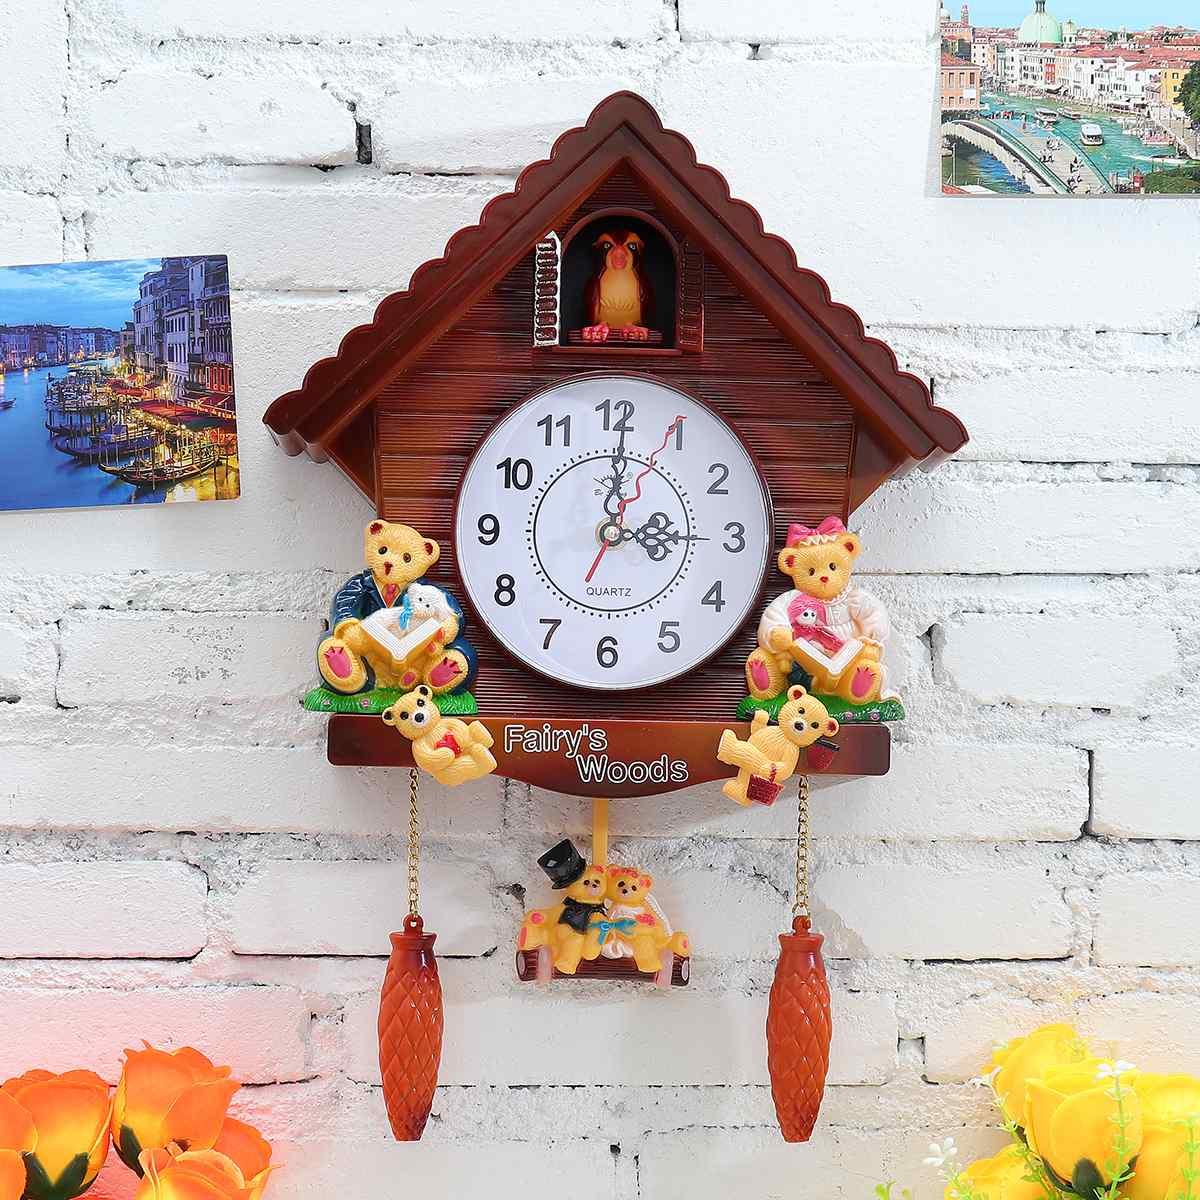 Clock Bird Cuckoo Alarm Clock Vintage Cuckoo Clock Living Room Wall Watch Modern Brief Children Decorations Home Day Time Alarm|Wall Clocks| |  - title=